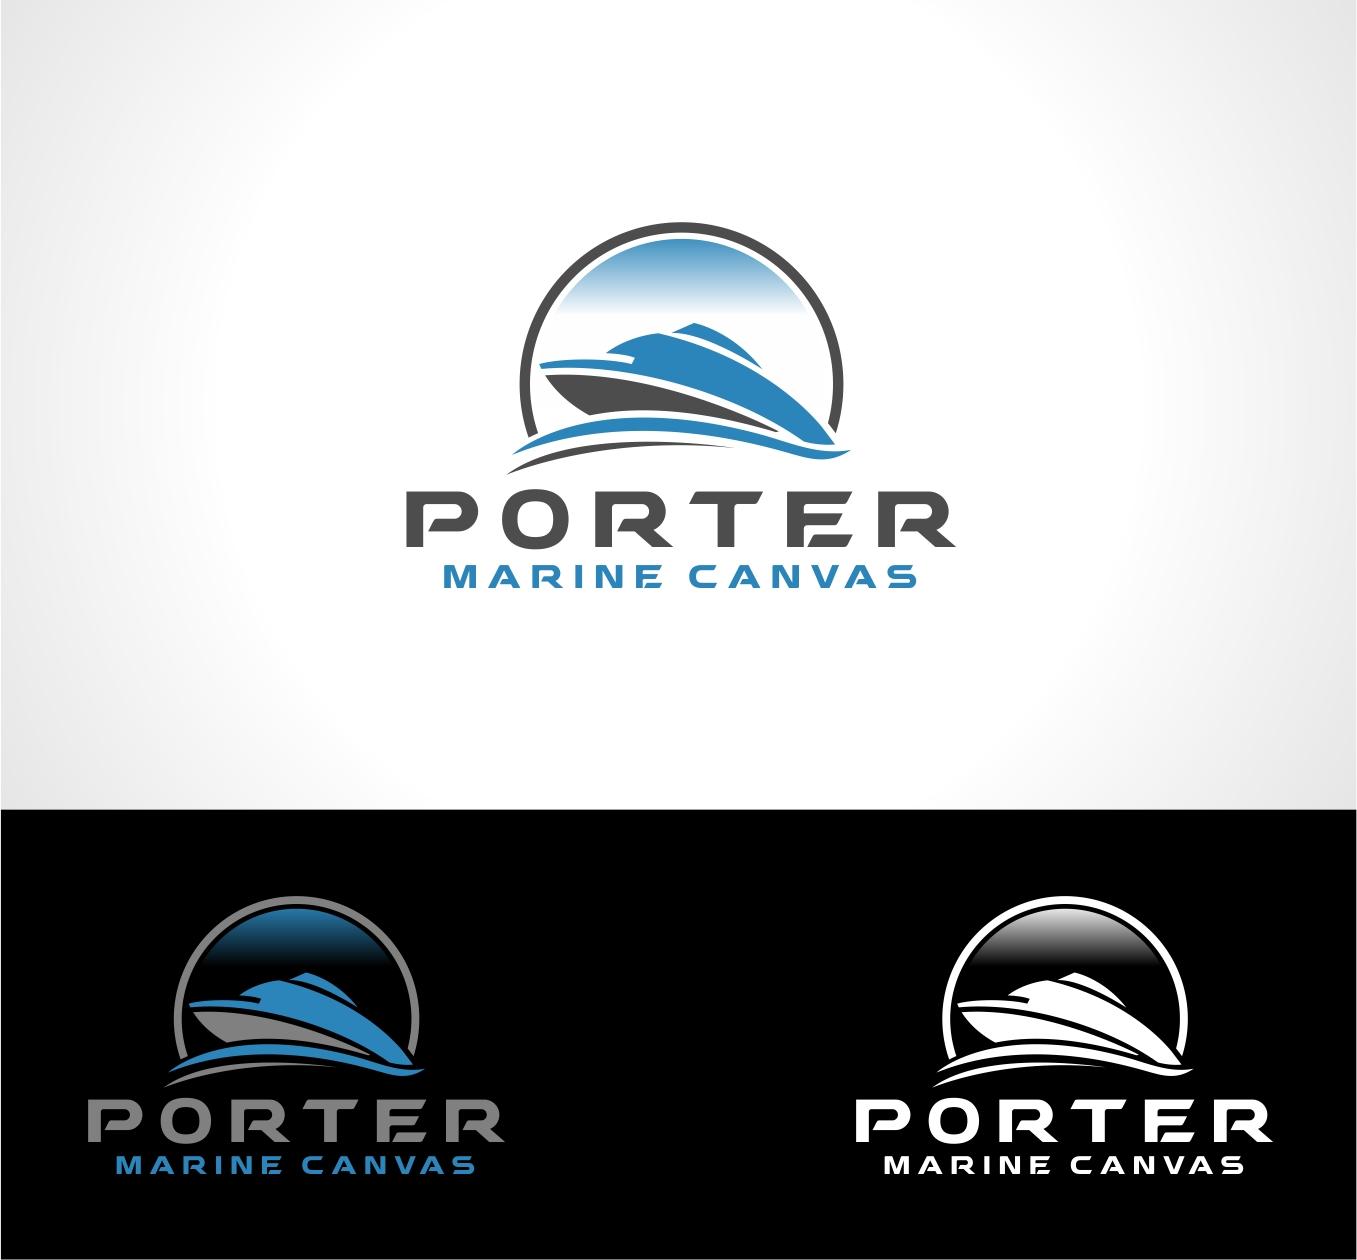 Logo Design by haidu - Entry No. 138 in the Logo Design Contest Imaginative Logo Design for Porter Marine Canvas.